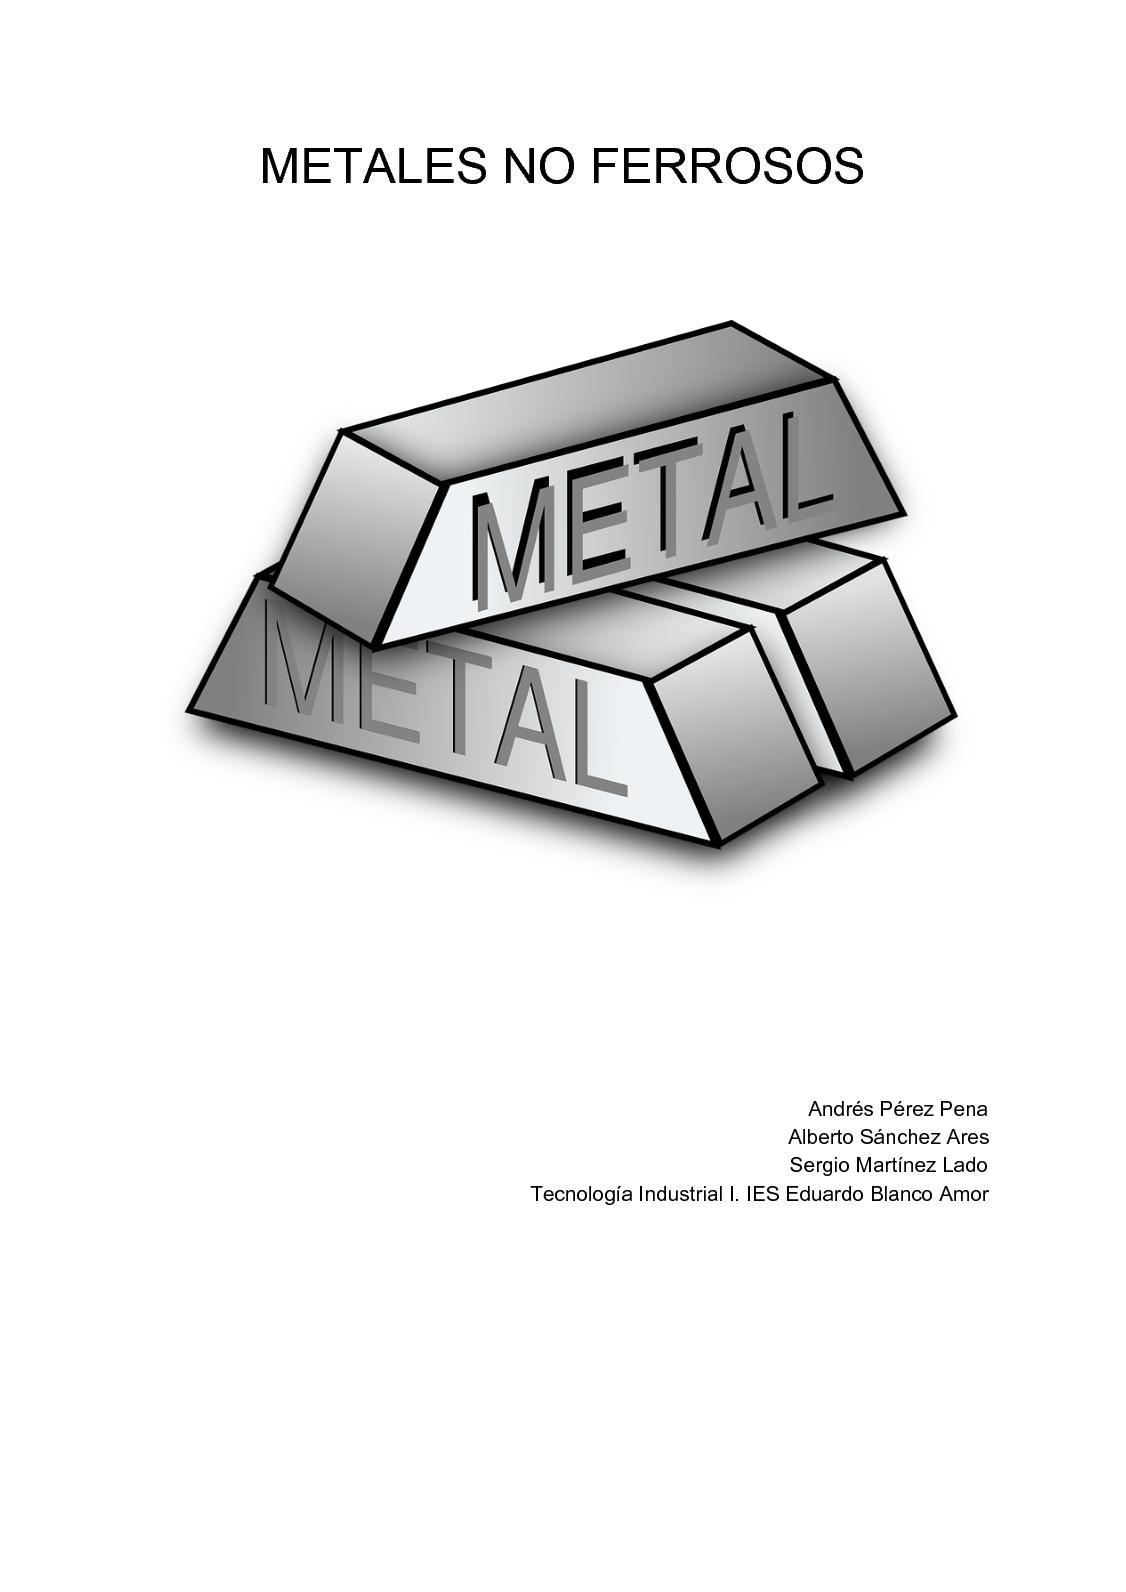 Metales no ferrosos calameo downloader page 1 urtaz Choice Image